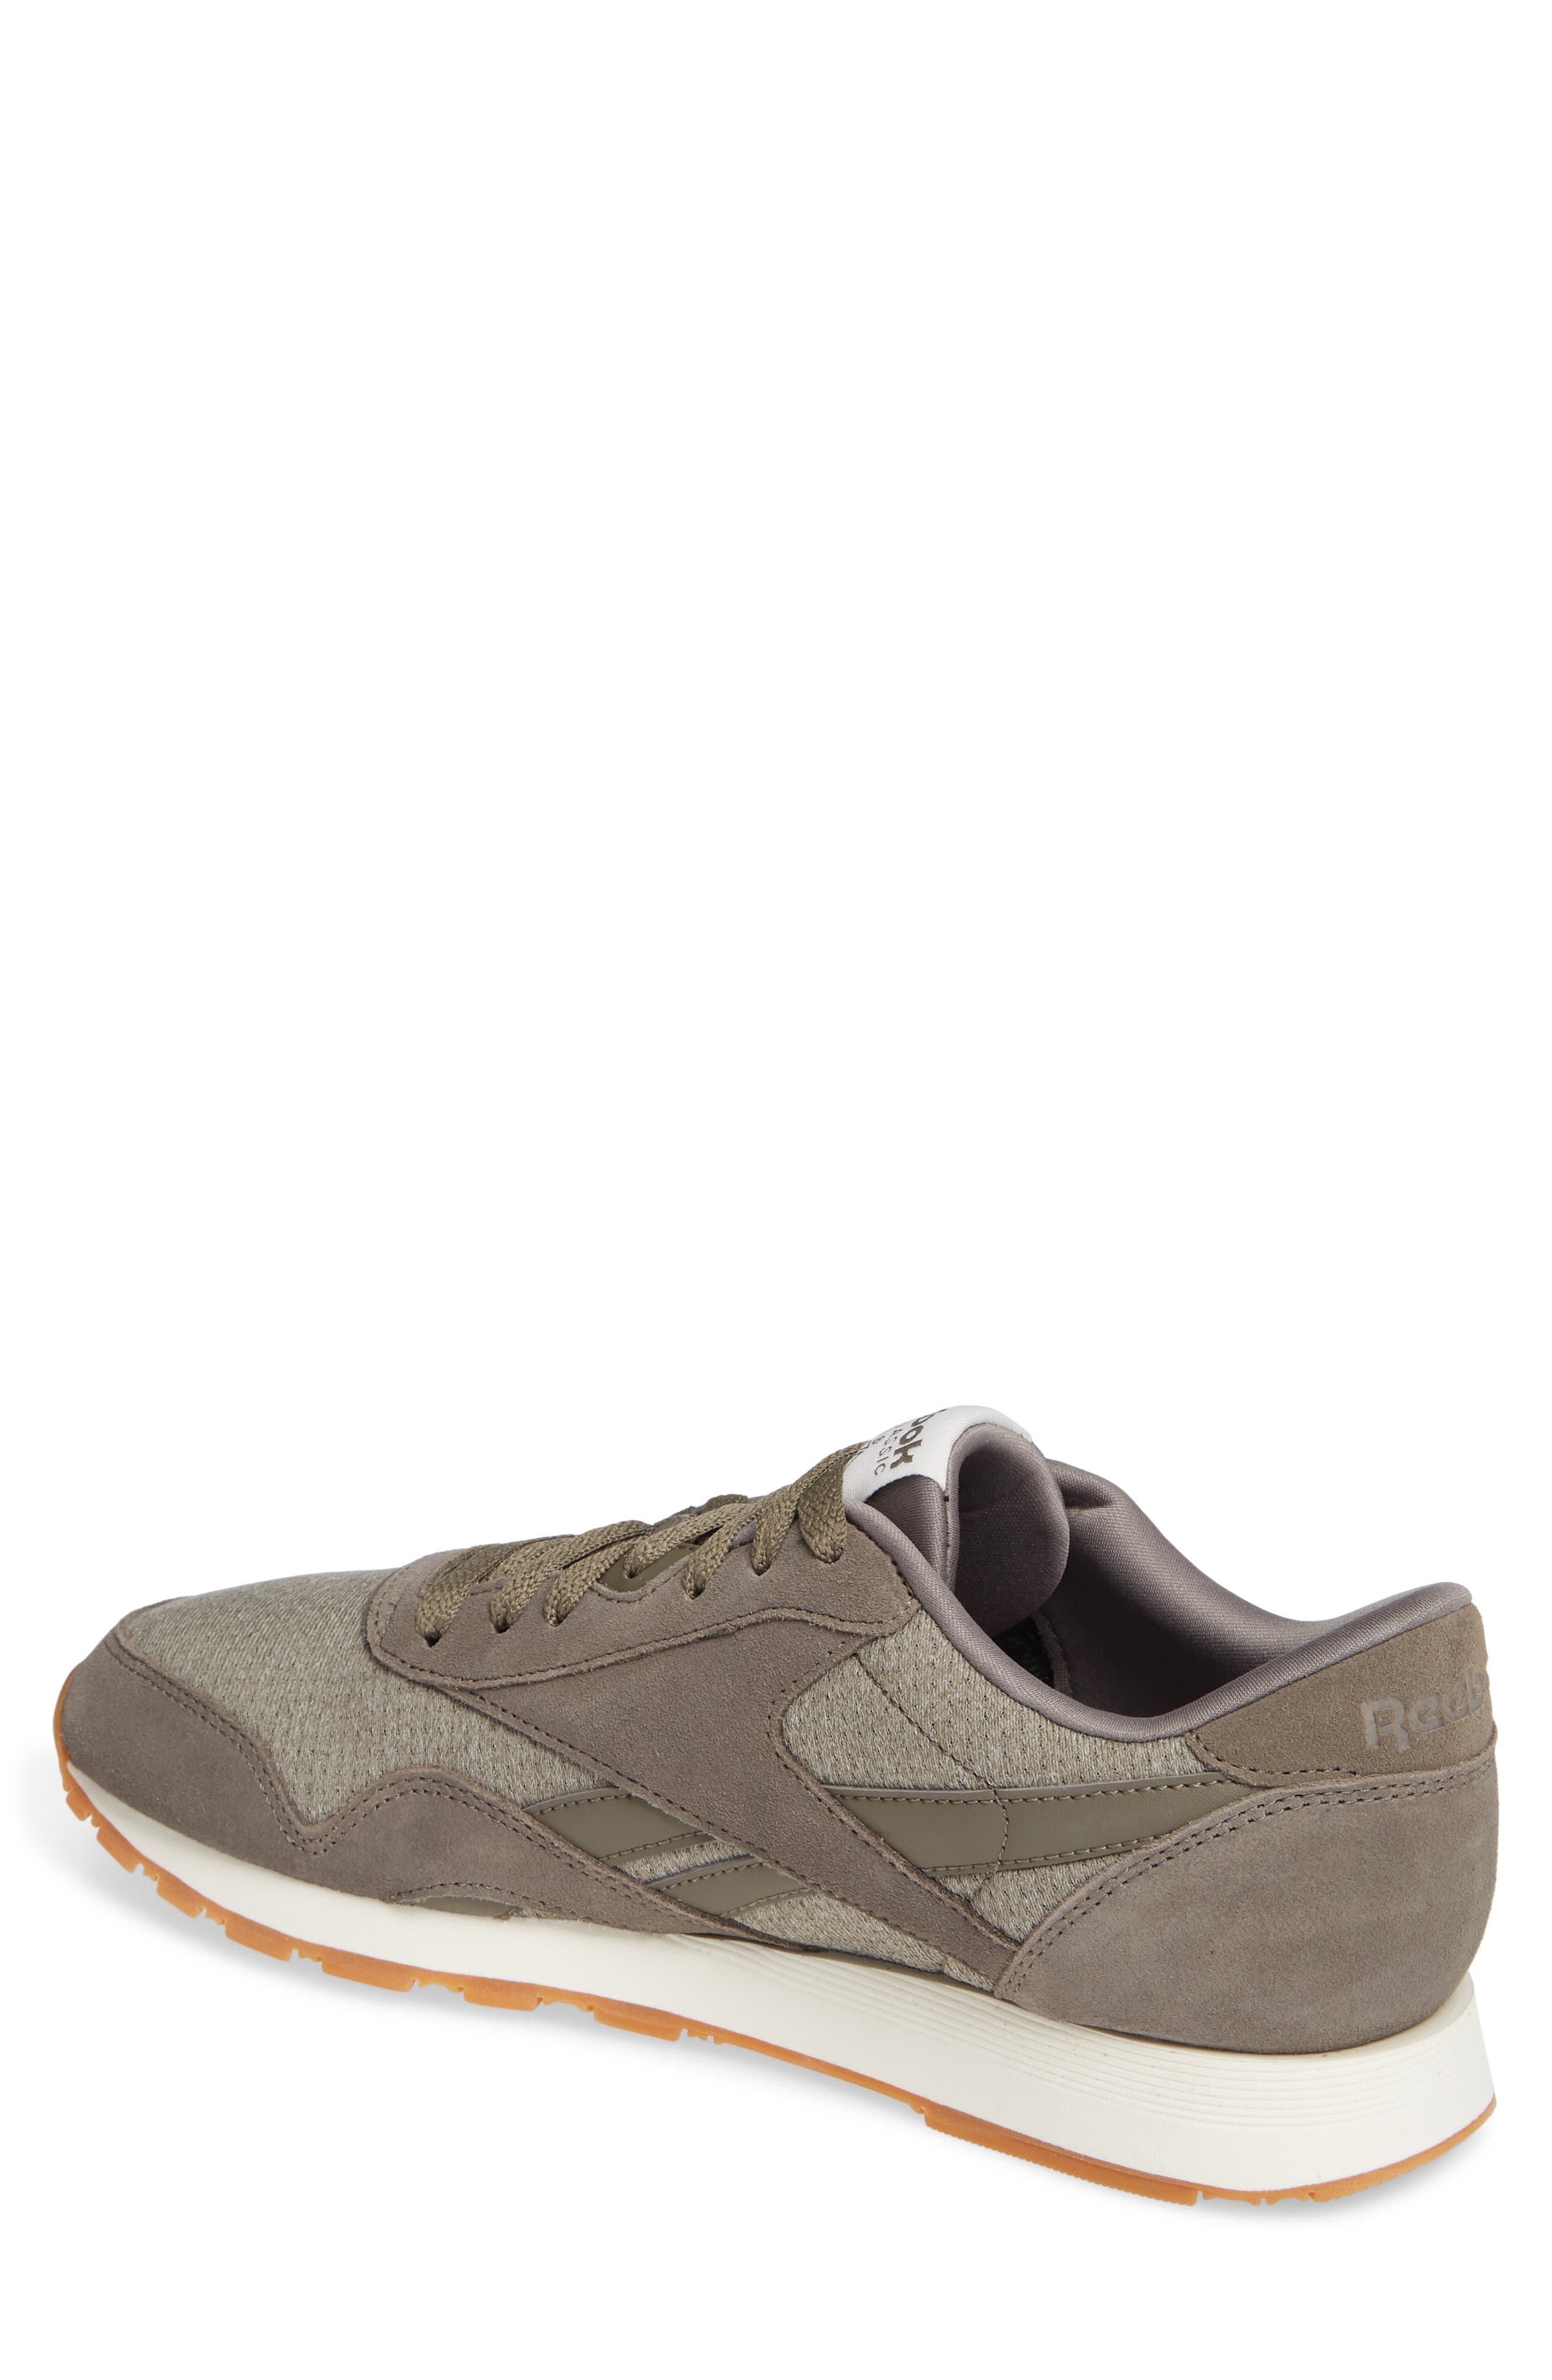 Classic Leather Nylon SG Sneaker,                             Alternate thumbnail 2, color,                             TERRAIN GREY/ CHALK